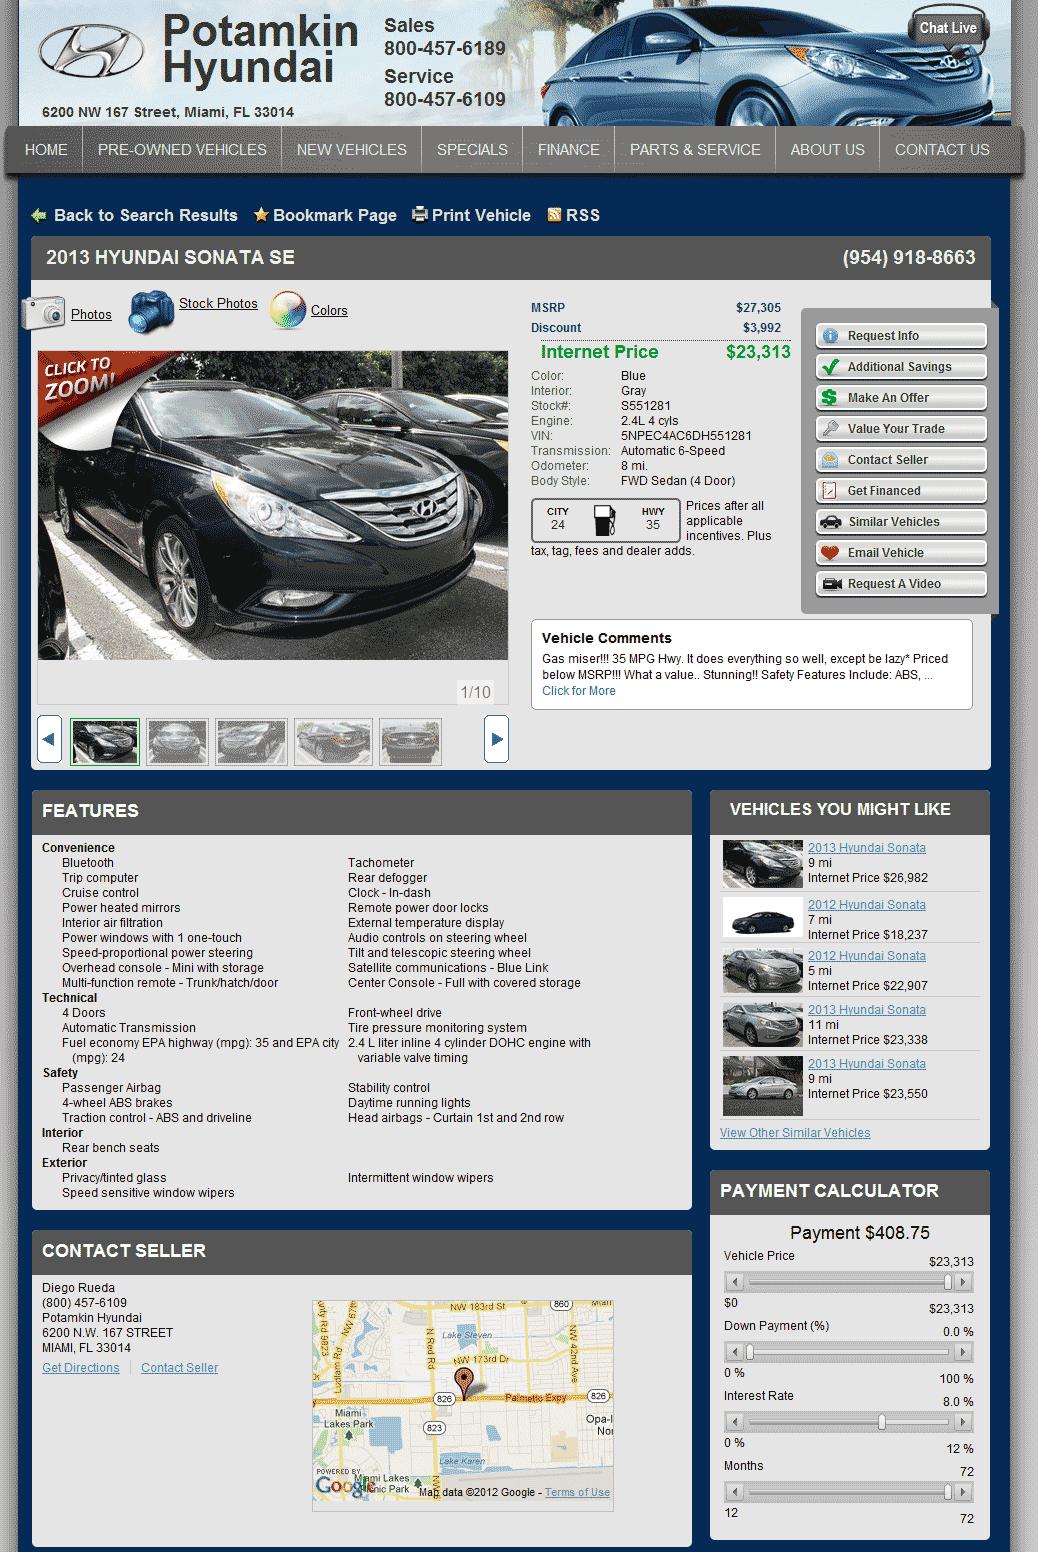 Lee Hyundai Of Goldsboro >> 2013 Hyundai Sonata Real Dealer Prices - Free - CostHelper.com